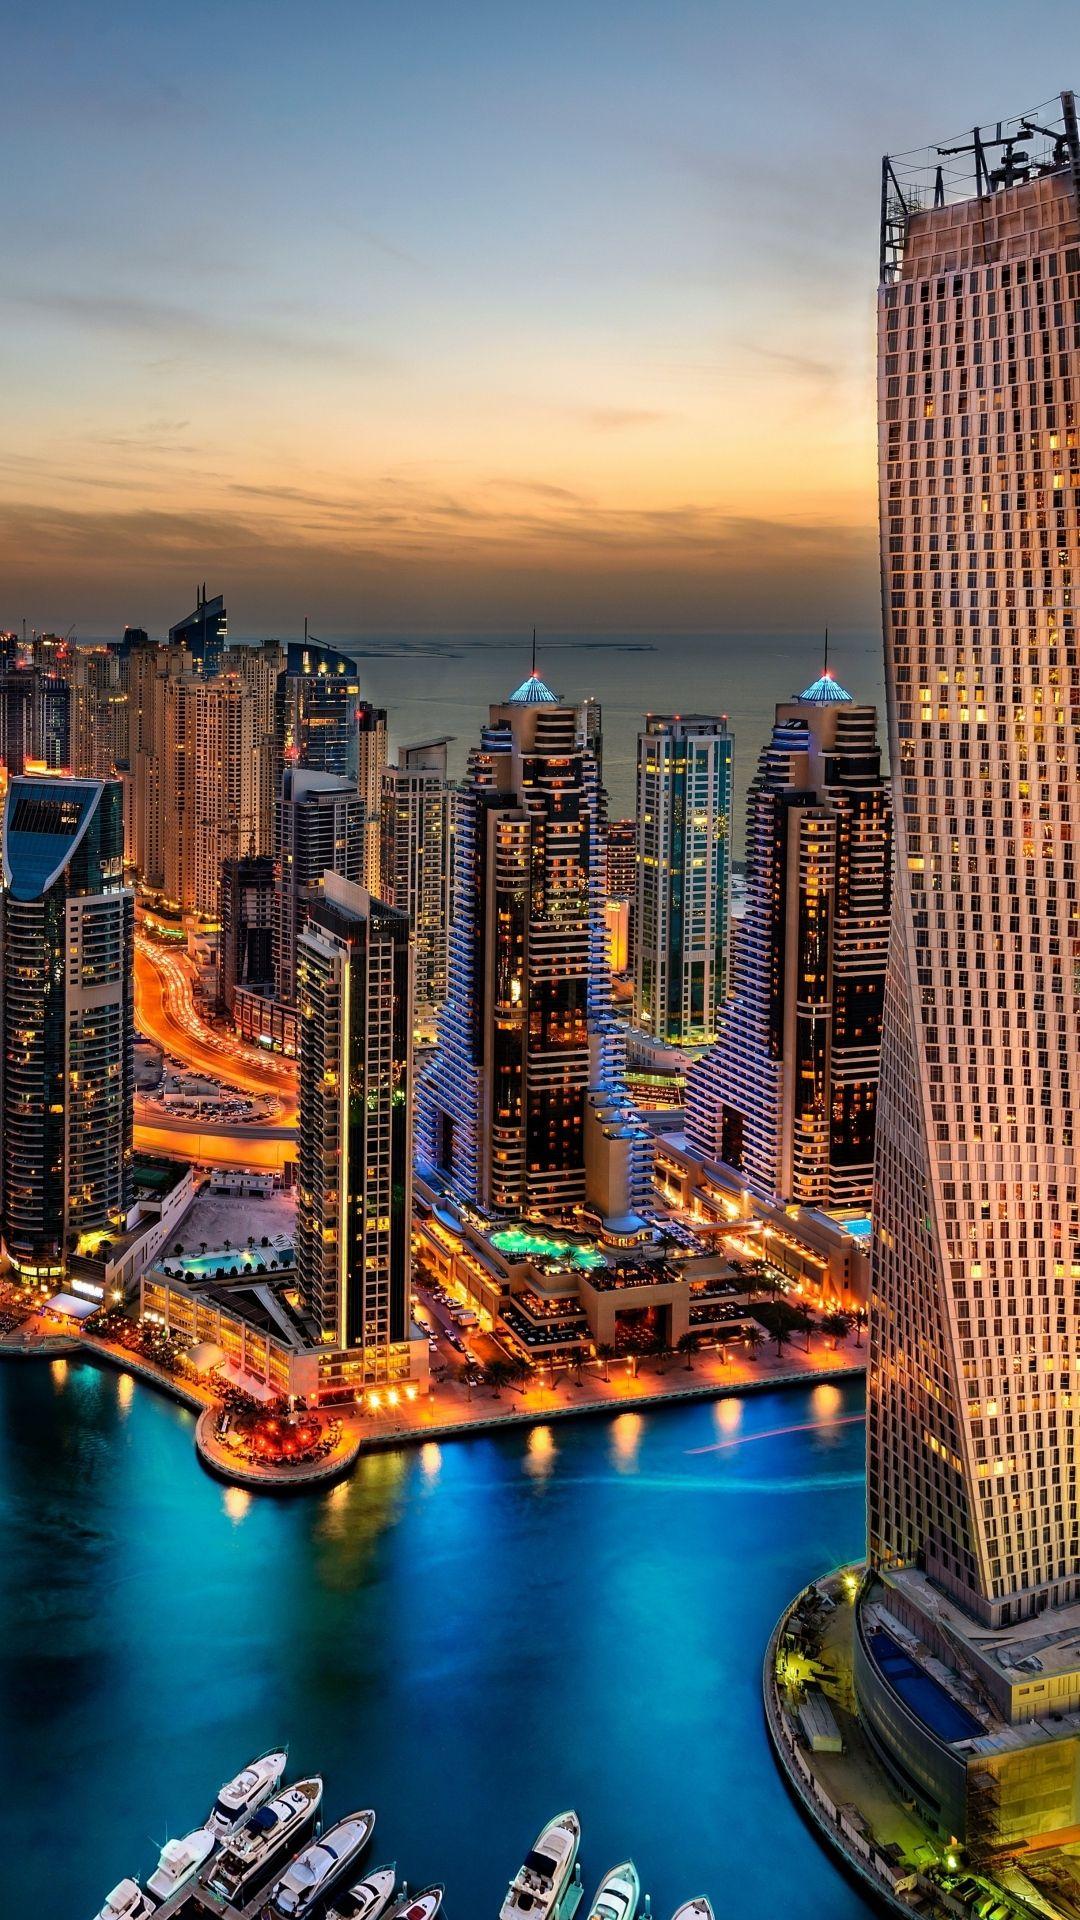 Fond D Ecran Gratuit Dubai Travel Dubai Travel Guide Dubai City